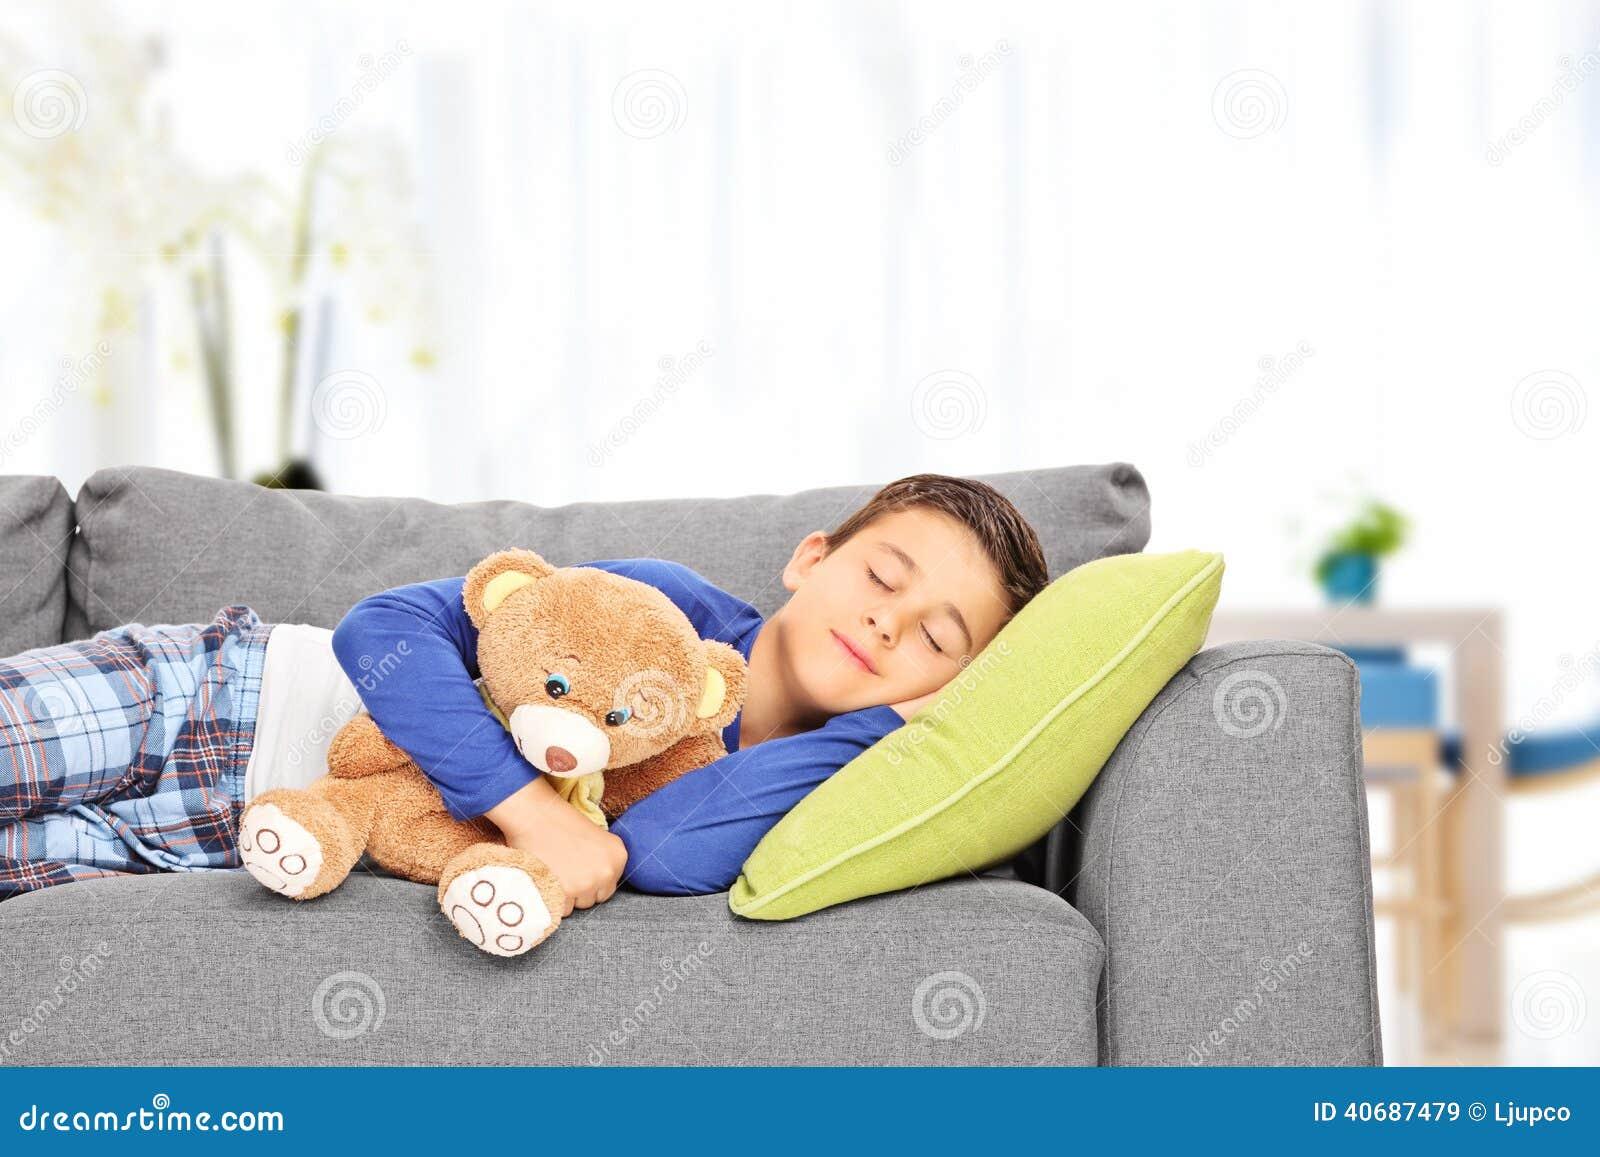 Little Kid Sleeping On Sofa With A Teddy Bear At Home Stock Photo ...